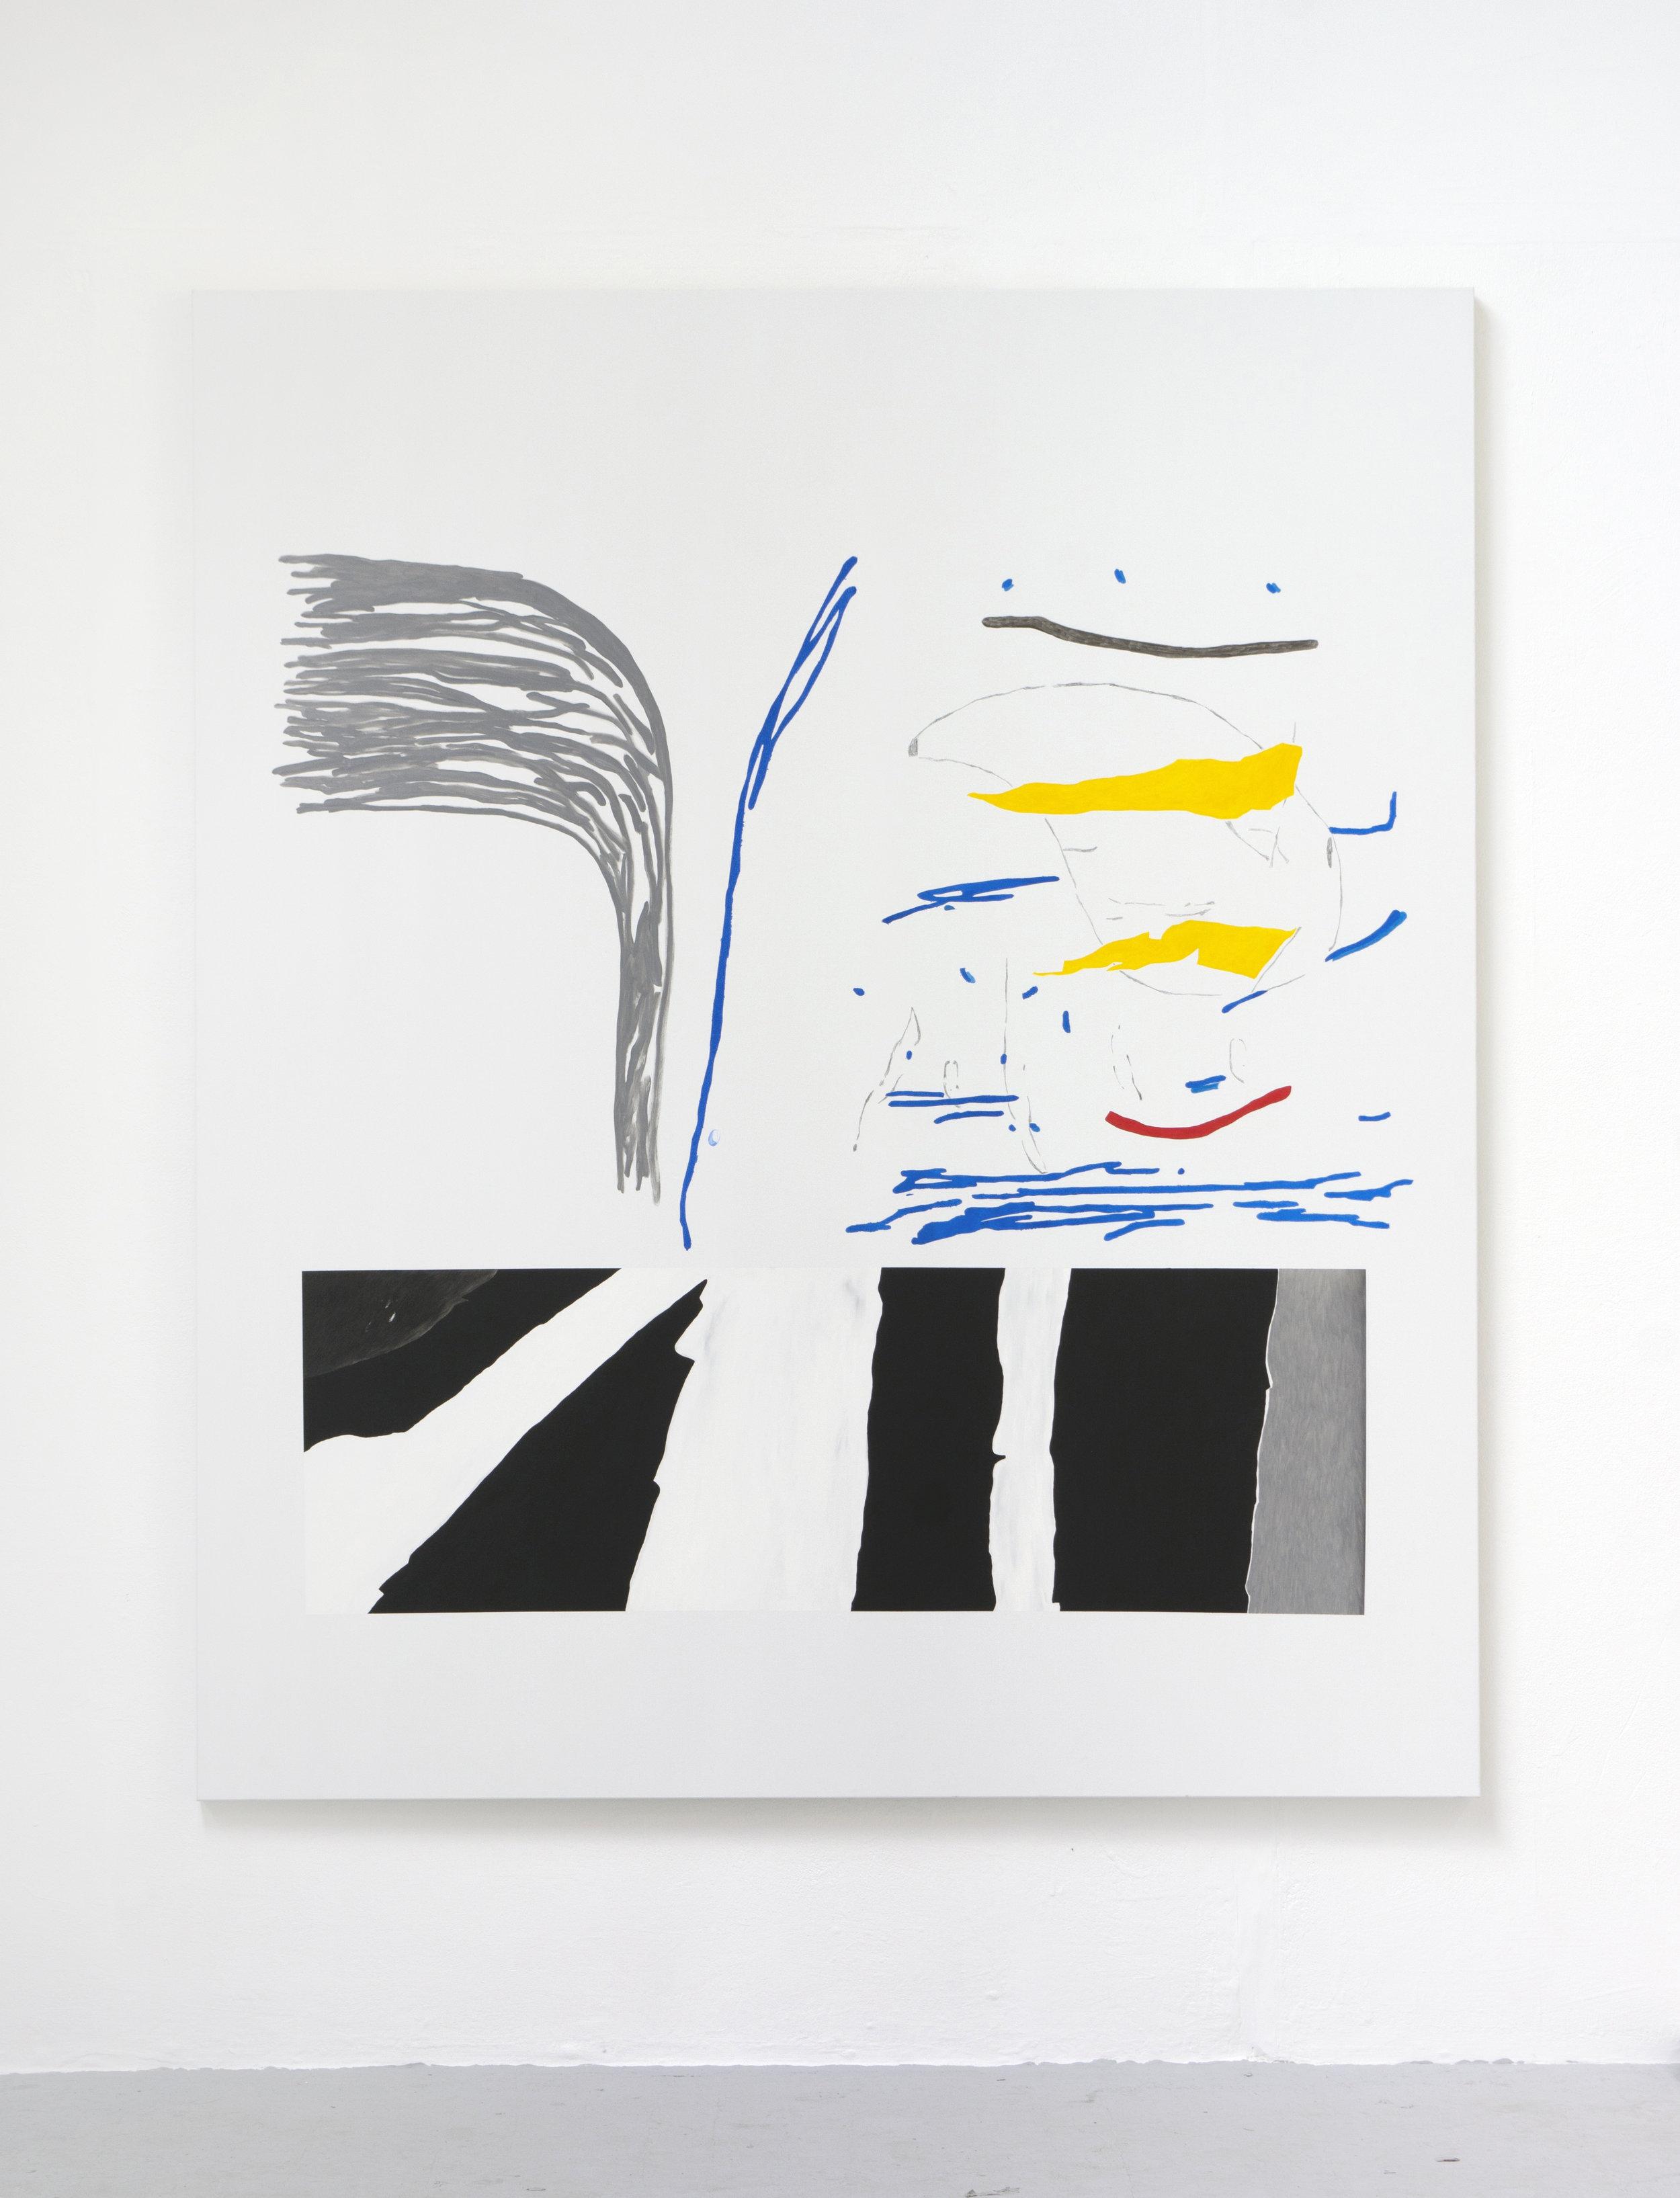 'Hybrid #1' - Acrylic, alkyd, graphite and pencil on canvas - 200 x 157 cm - 2018